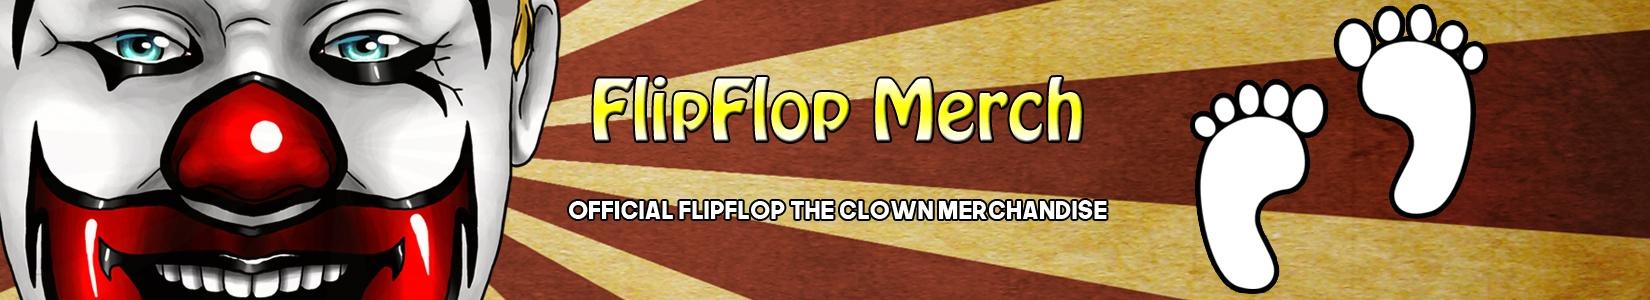 flipflopmerch Cover